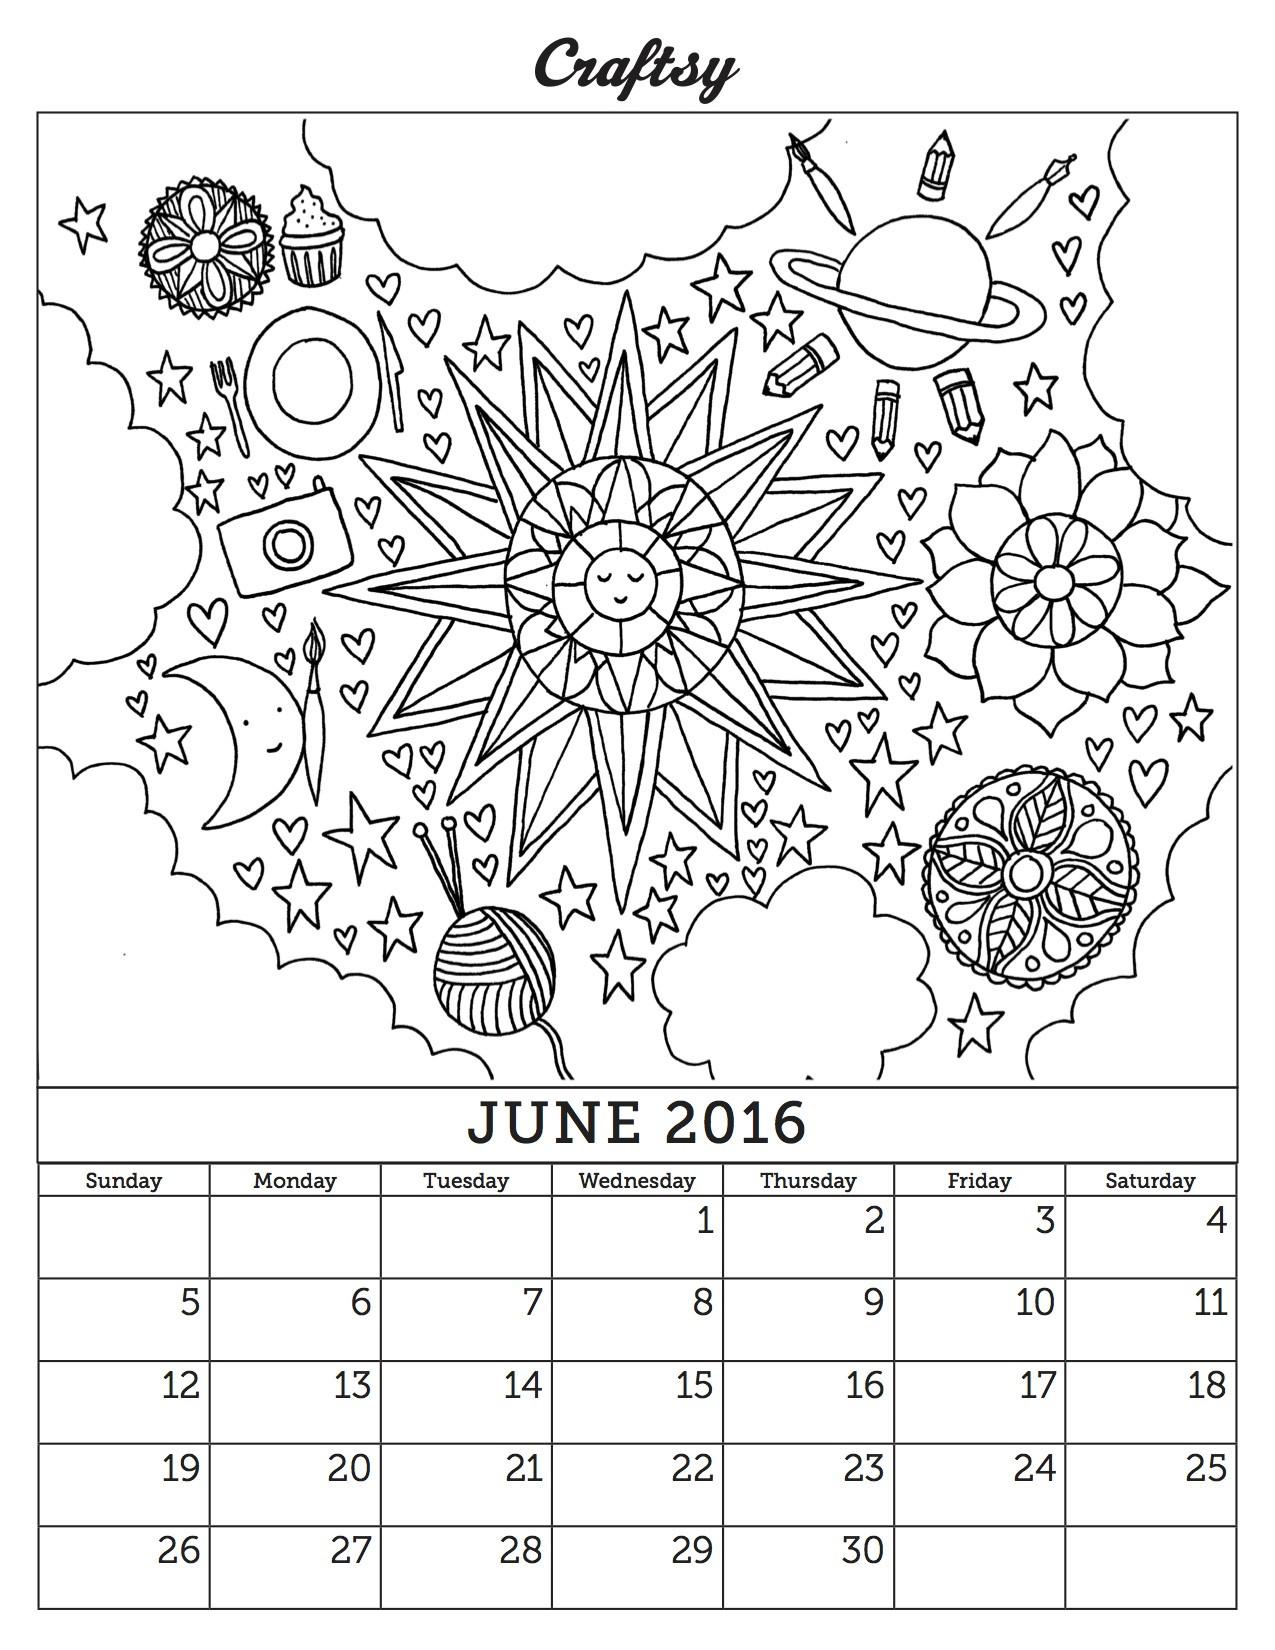 Coloring Book Calendars  June 2016 Coloring Book Calendar page